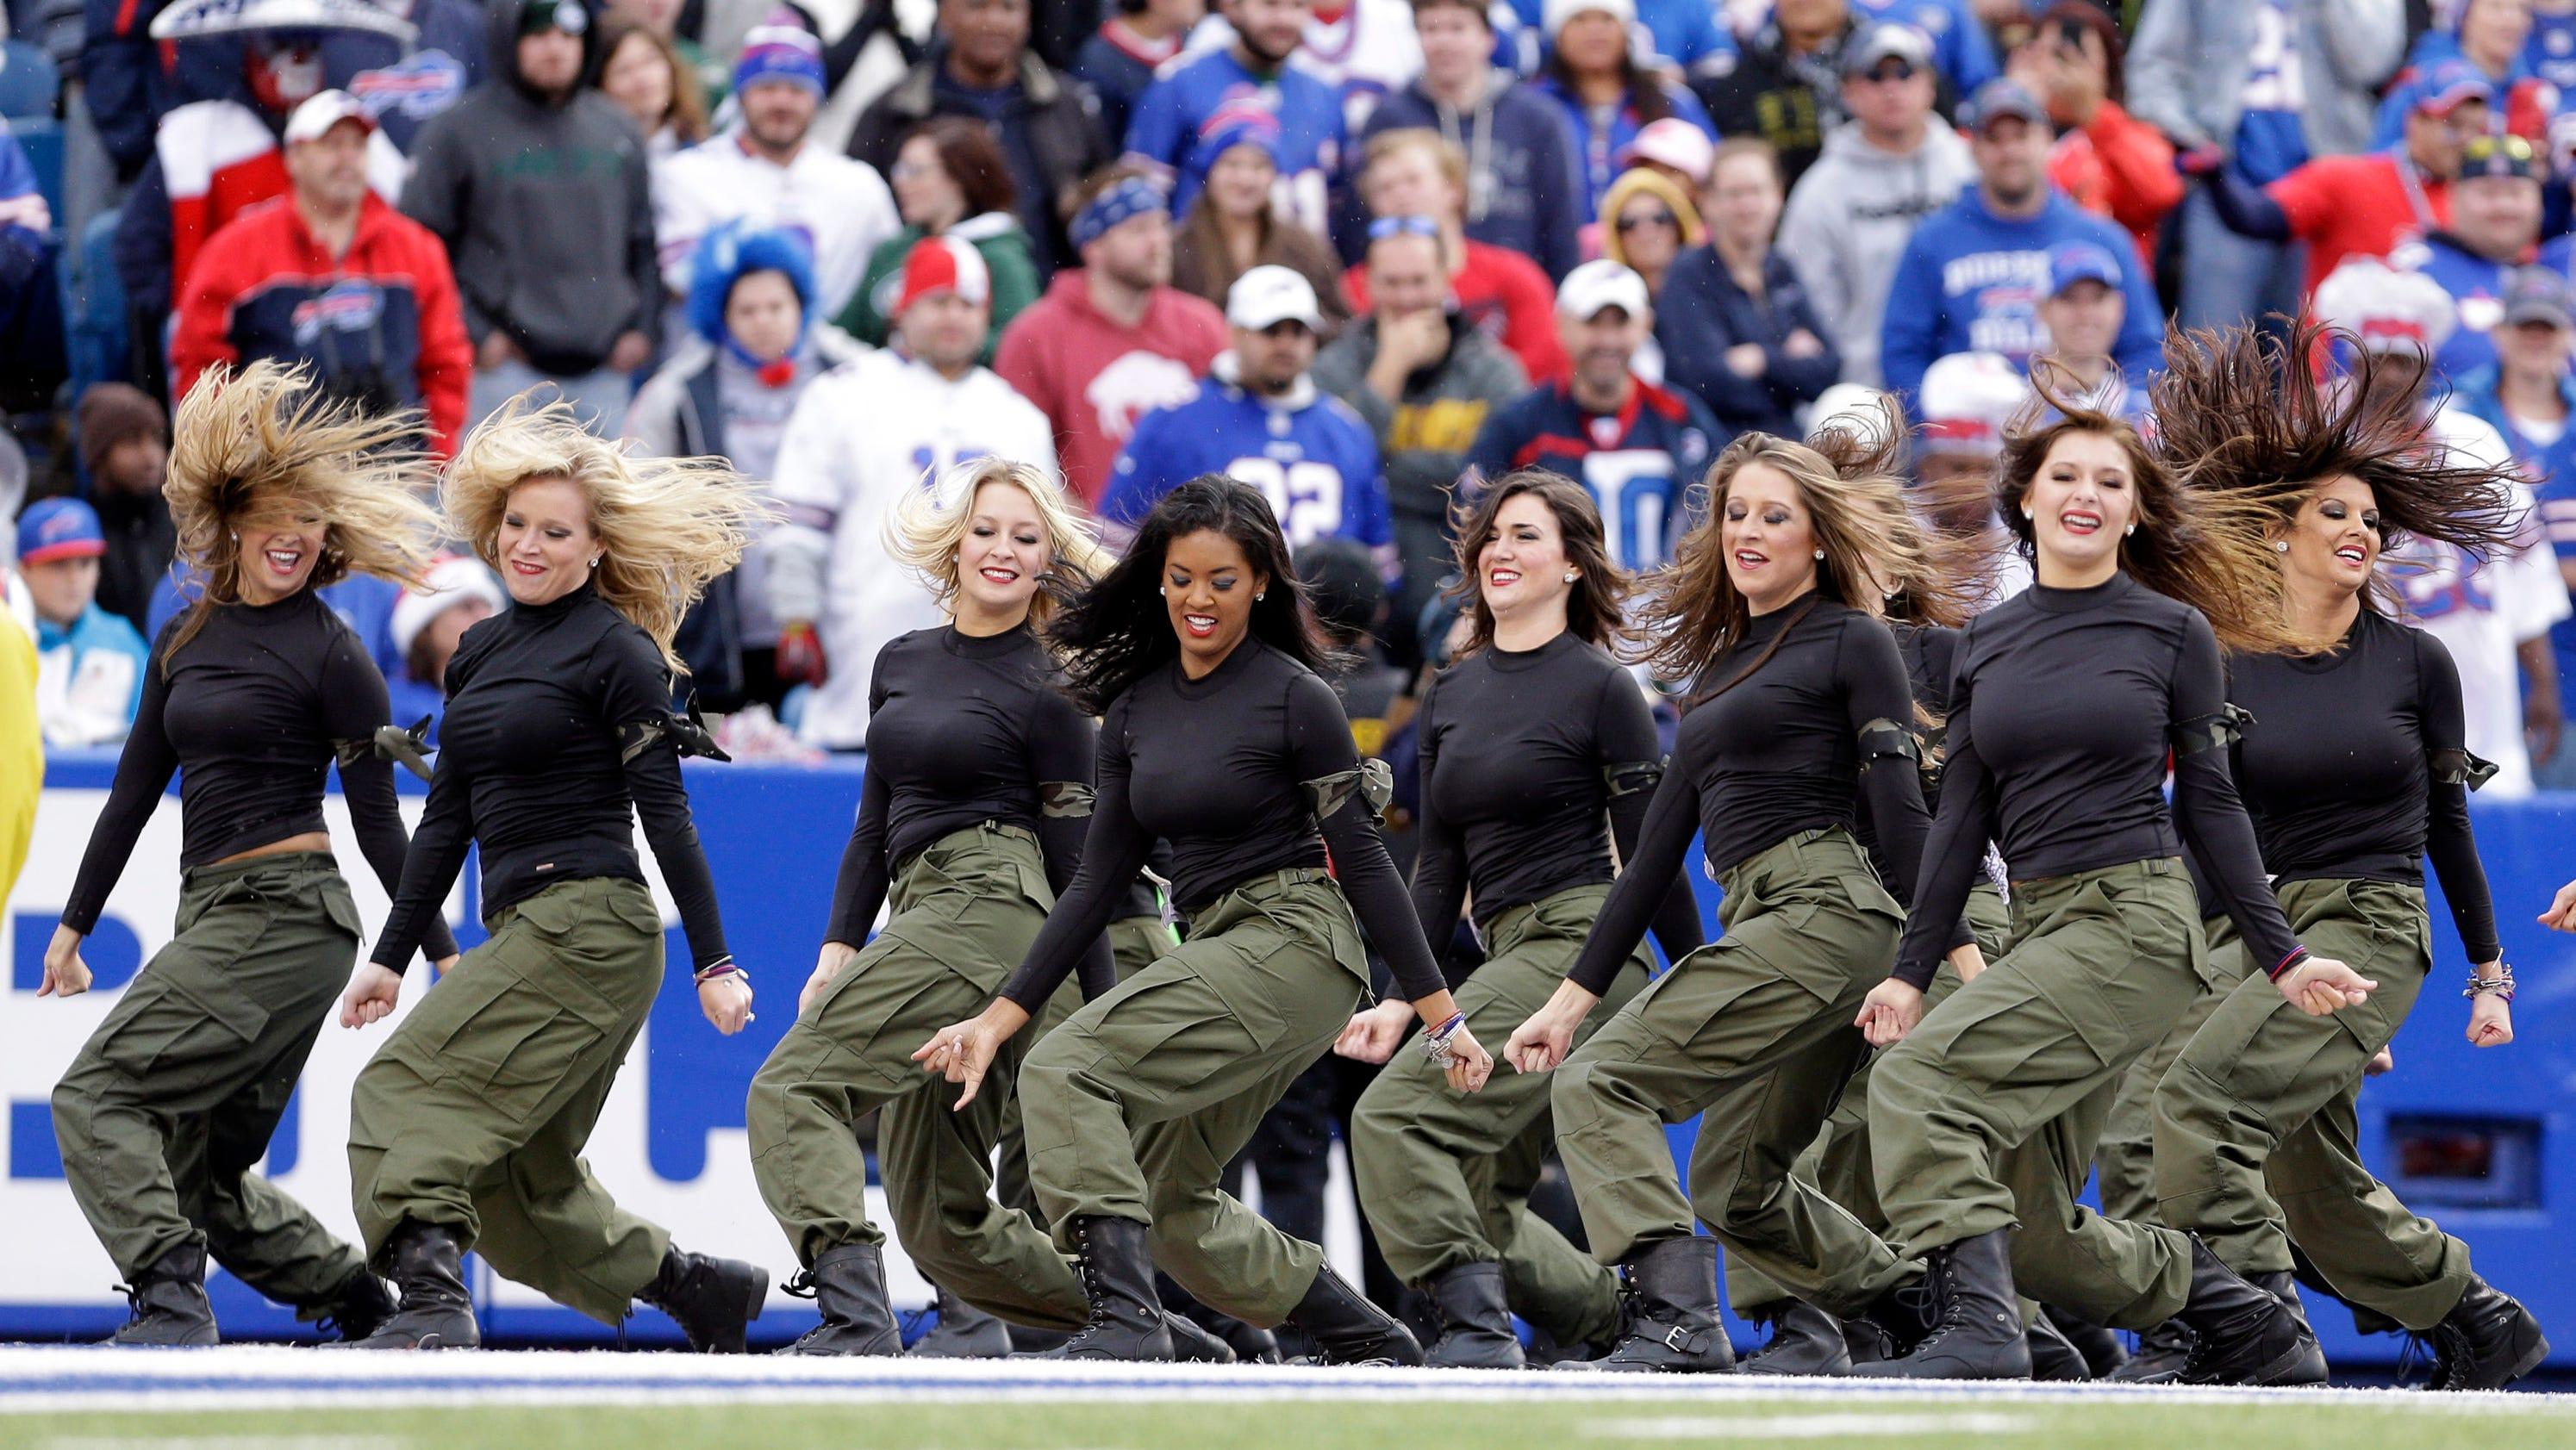 buffalo bills cheerleaders suspend operations